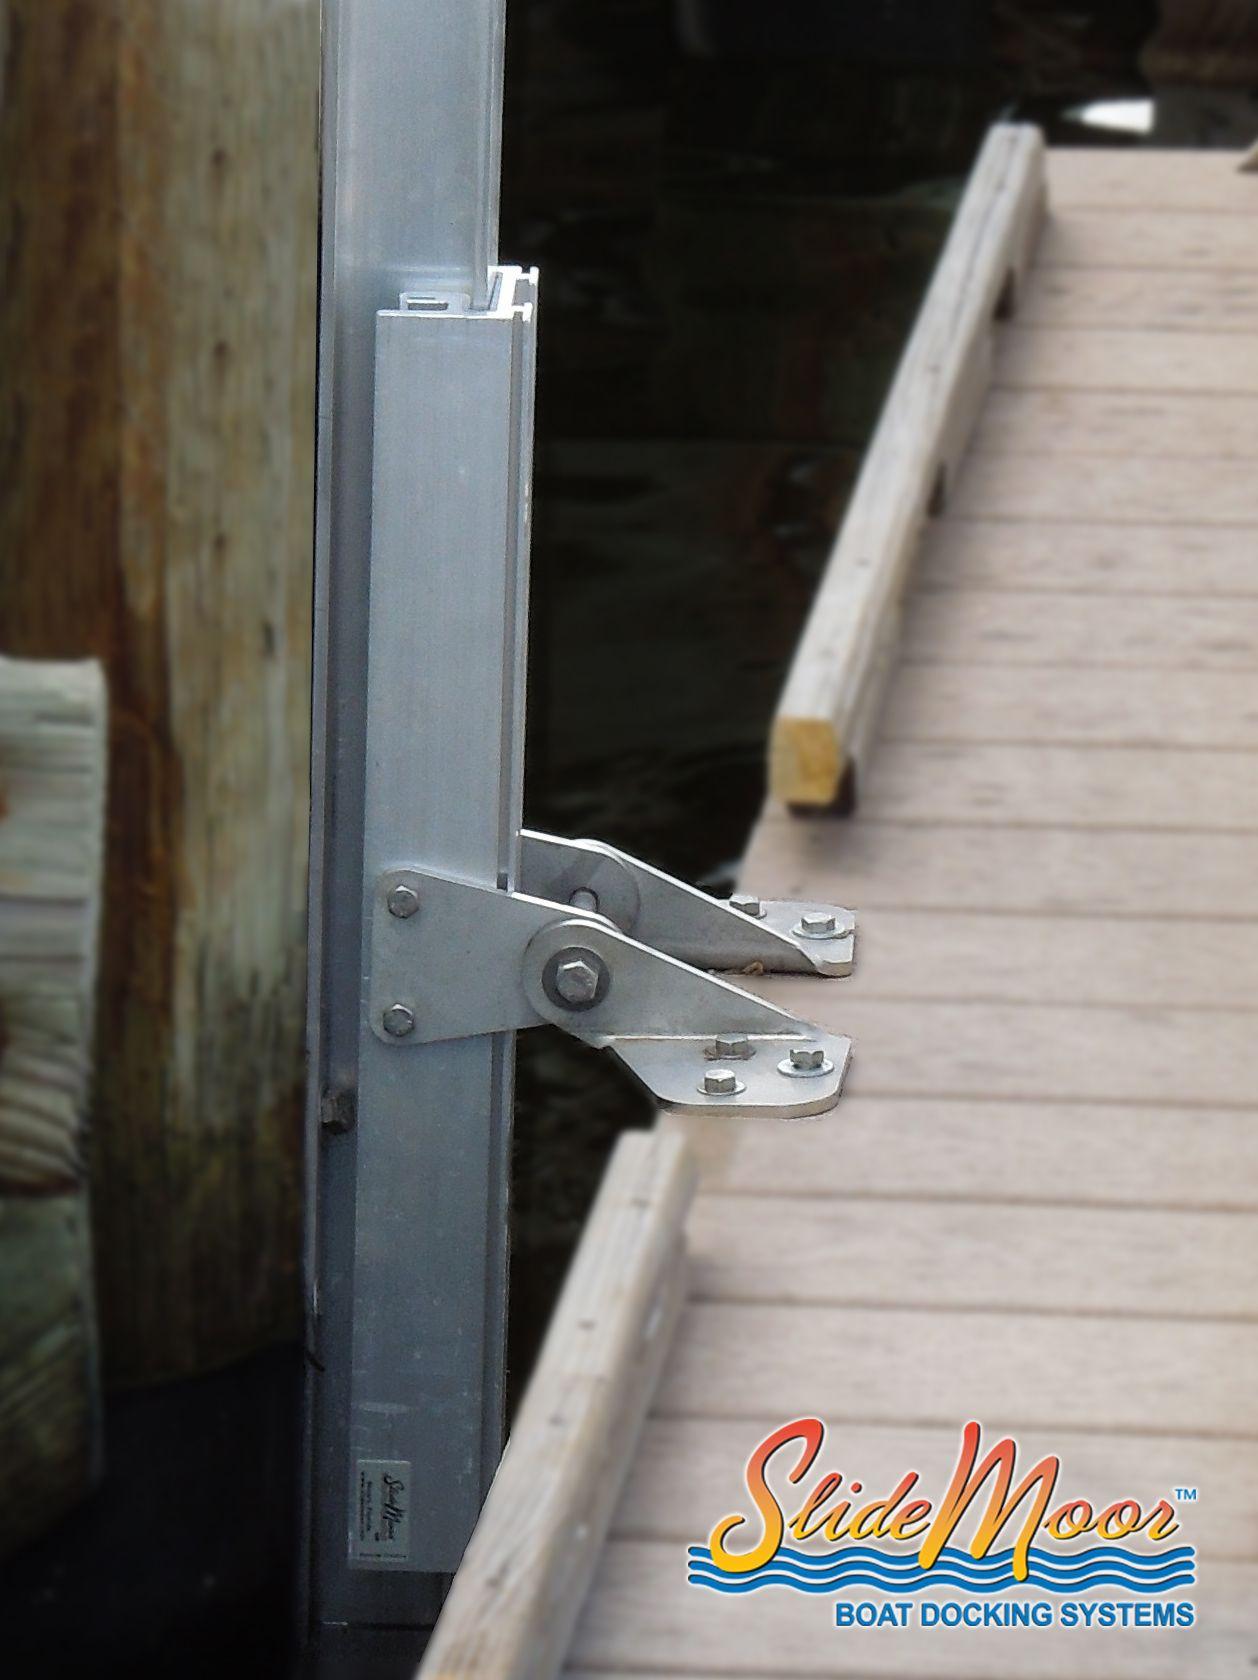 brand new product the slidemoor floating dock bracket fdb coming